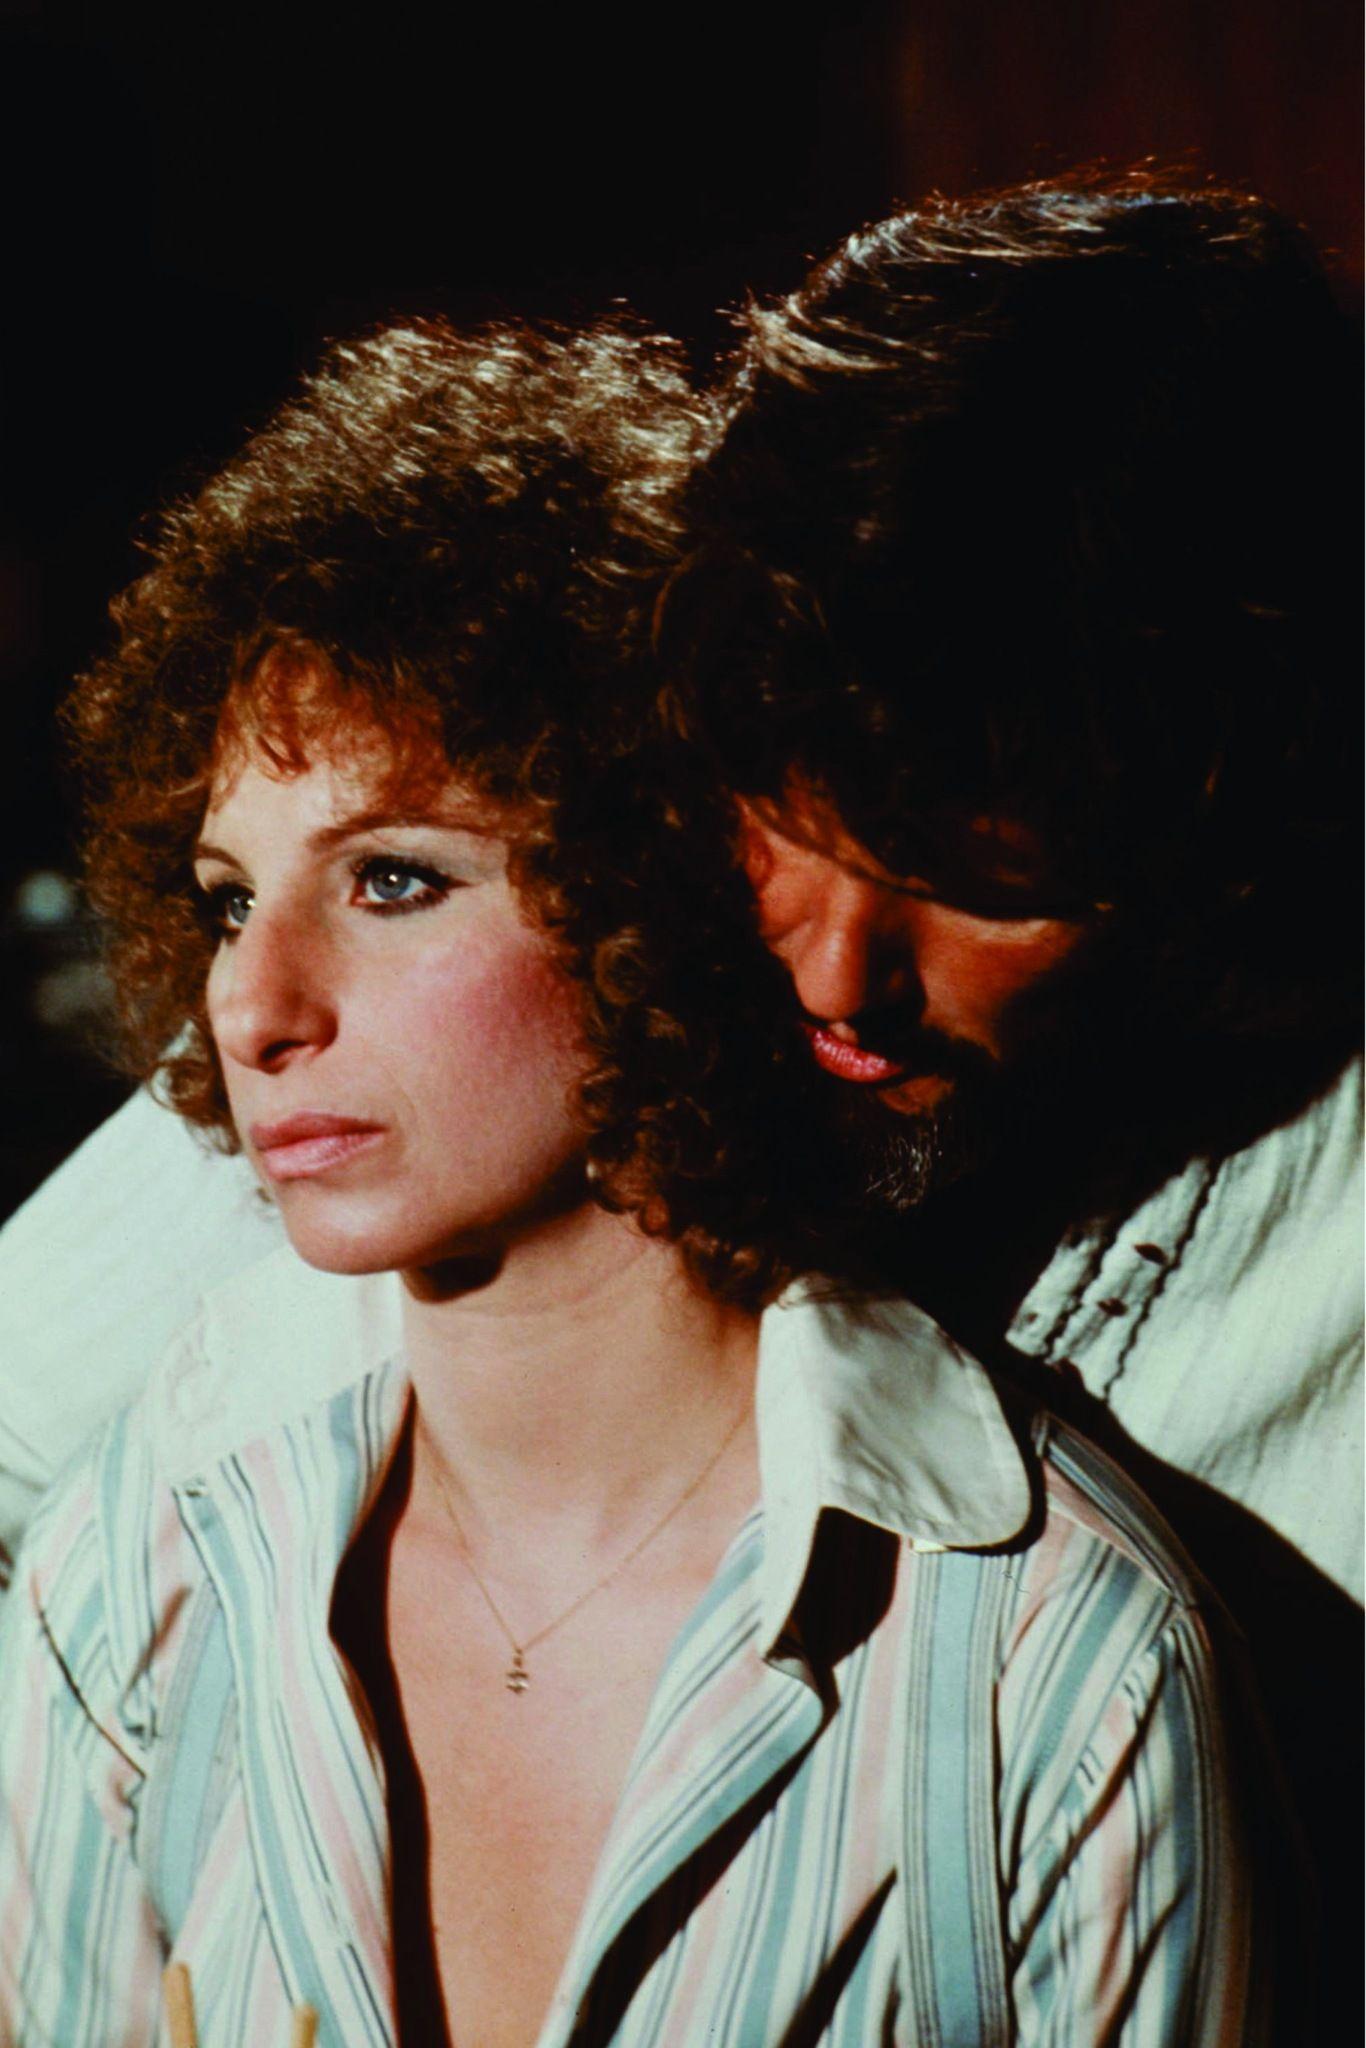 Barbra Streisand And Kris Kristofferson In A Star Is Born 1976